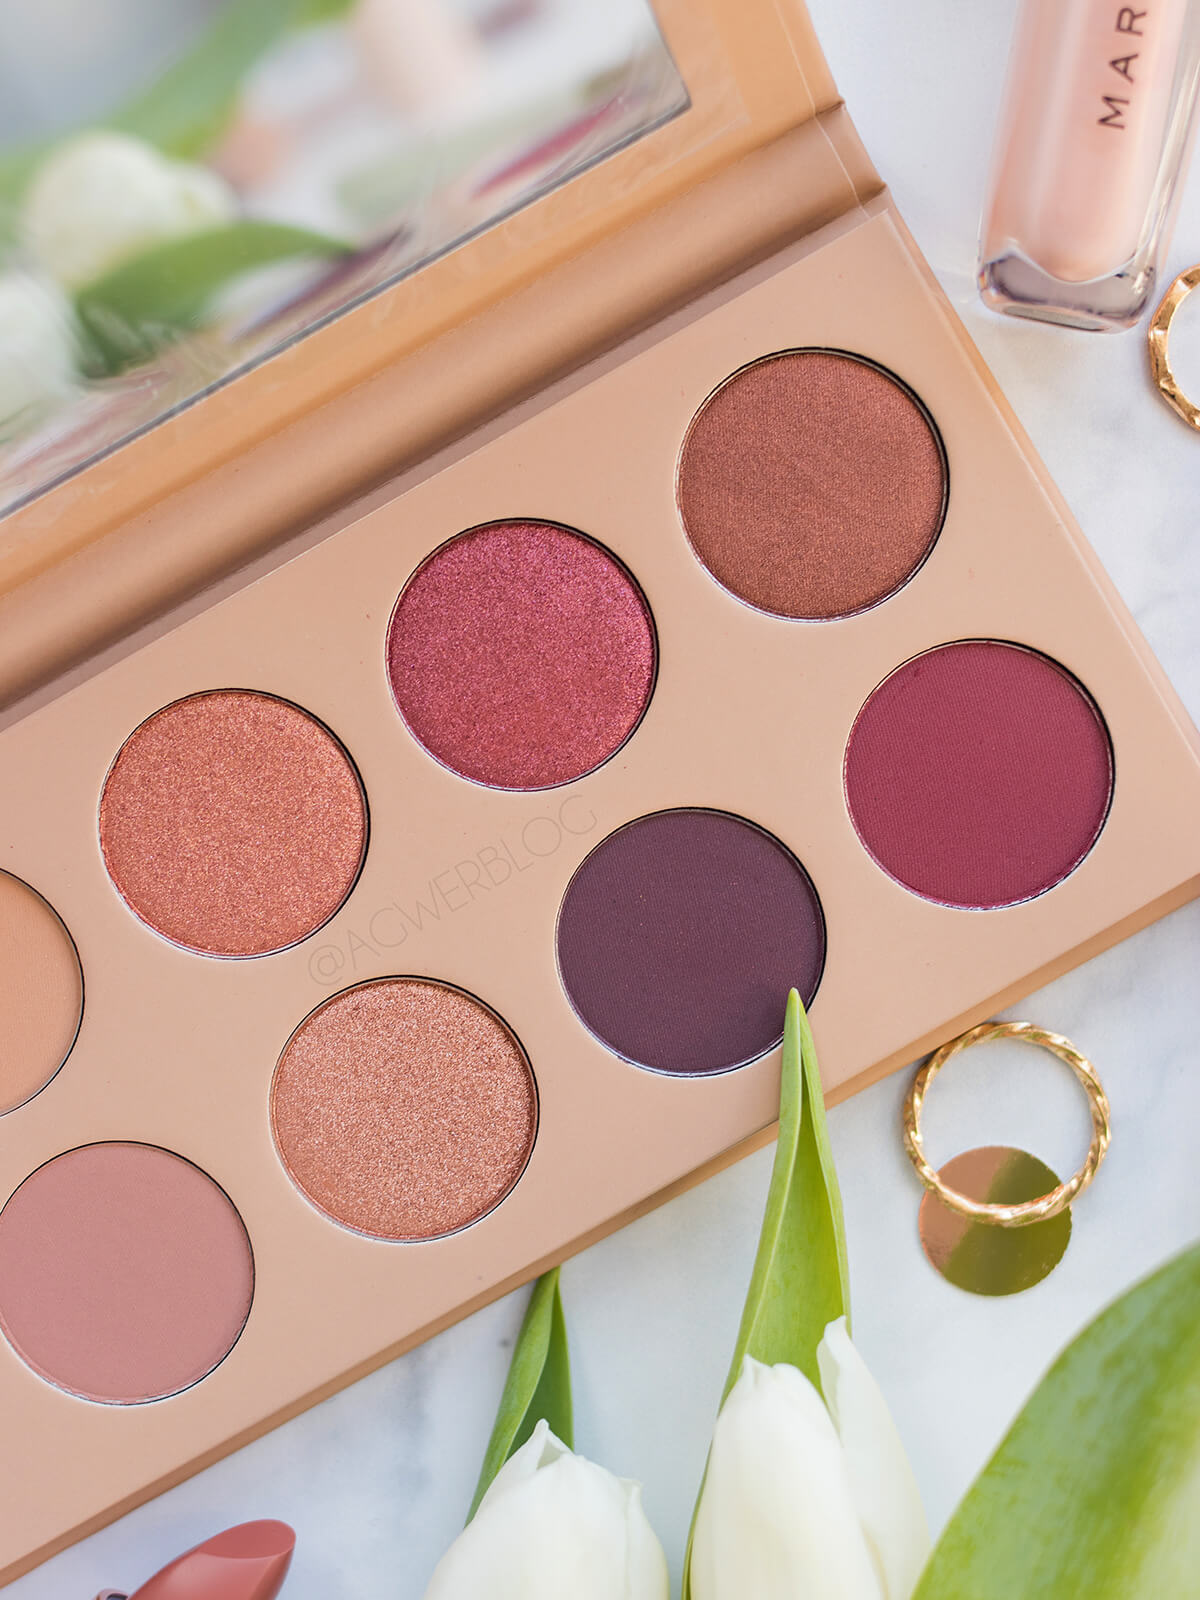 KKW Beauty Classic Blossom makeup